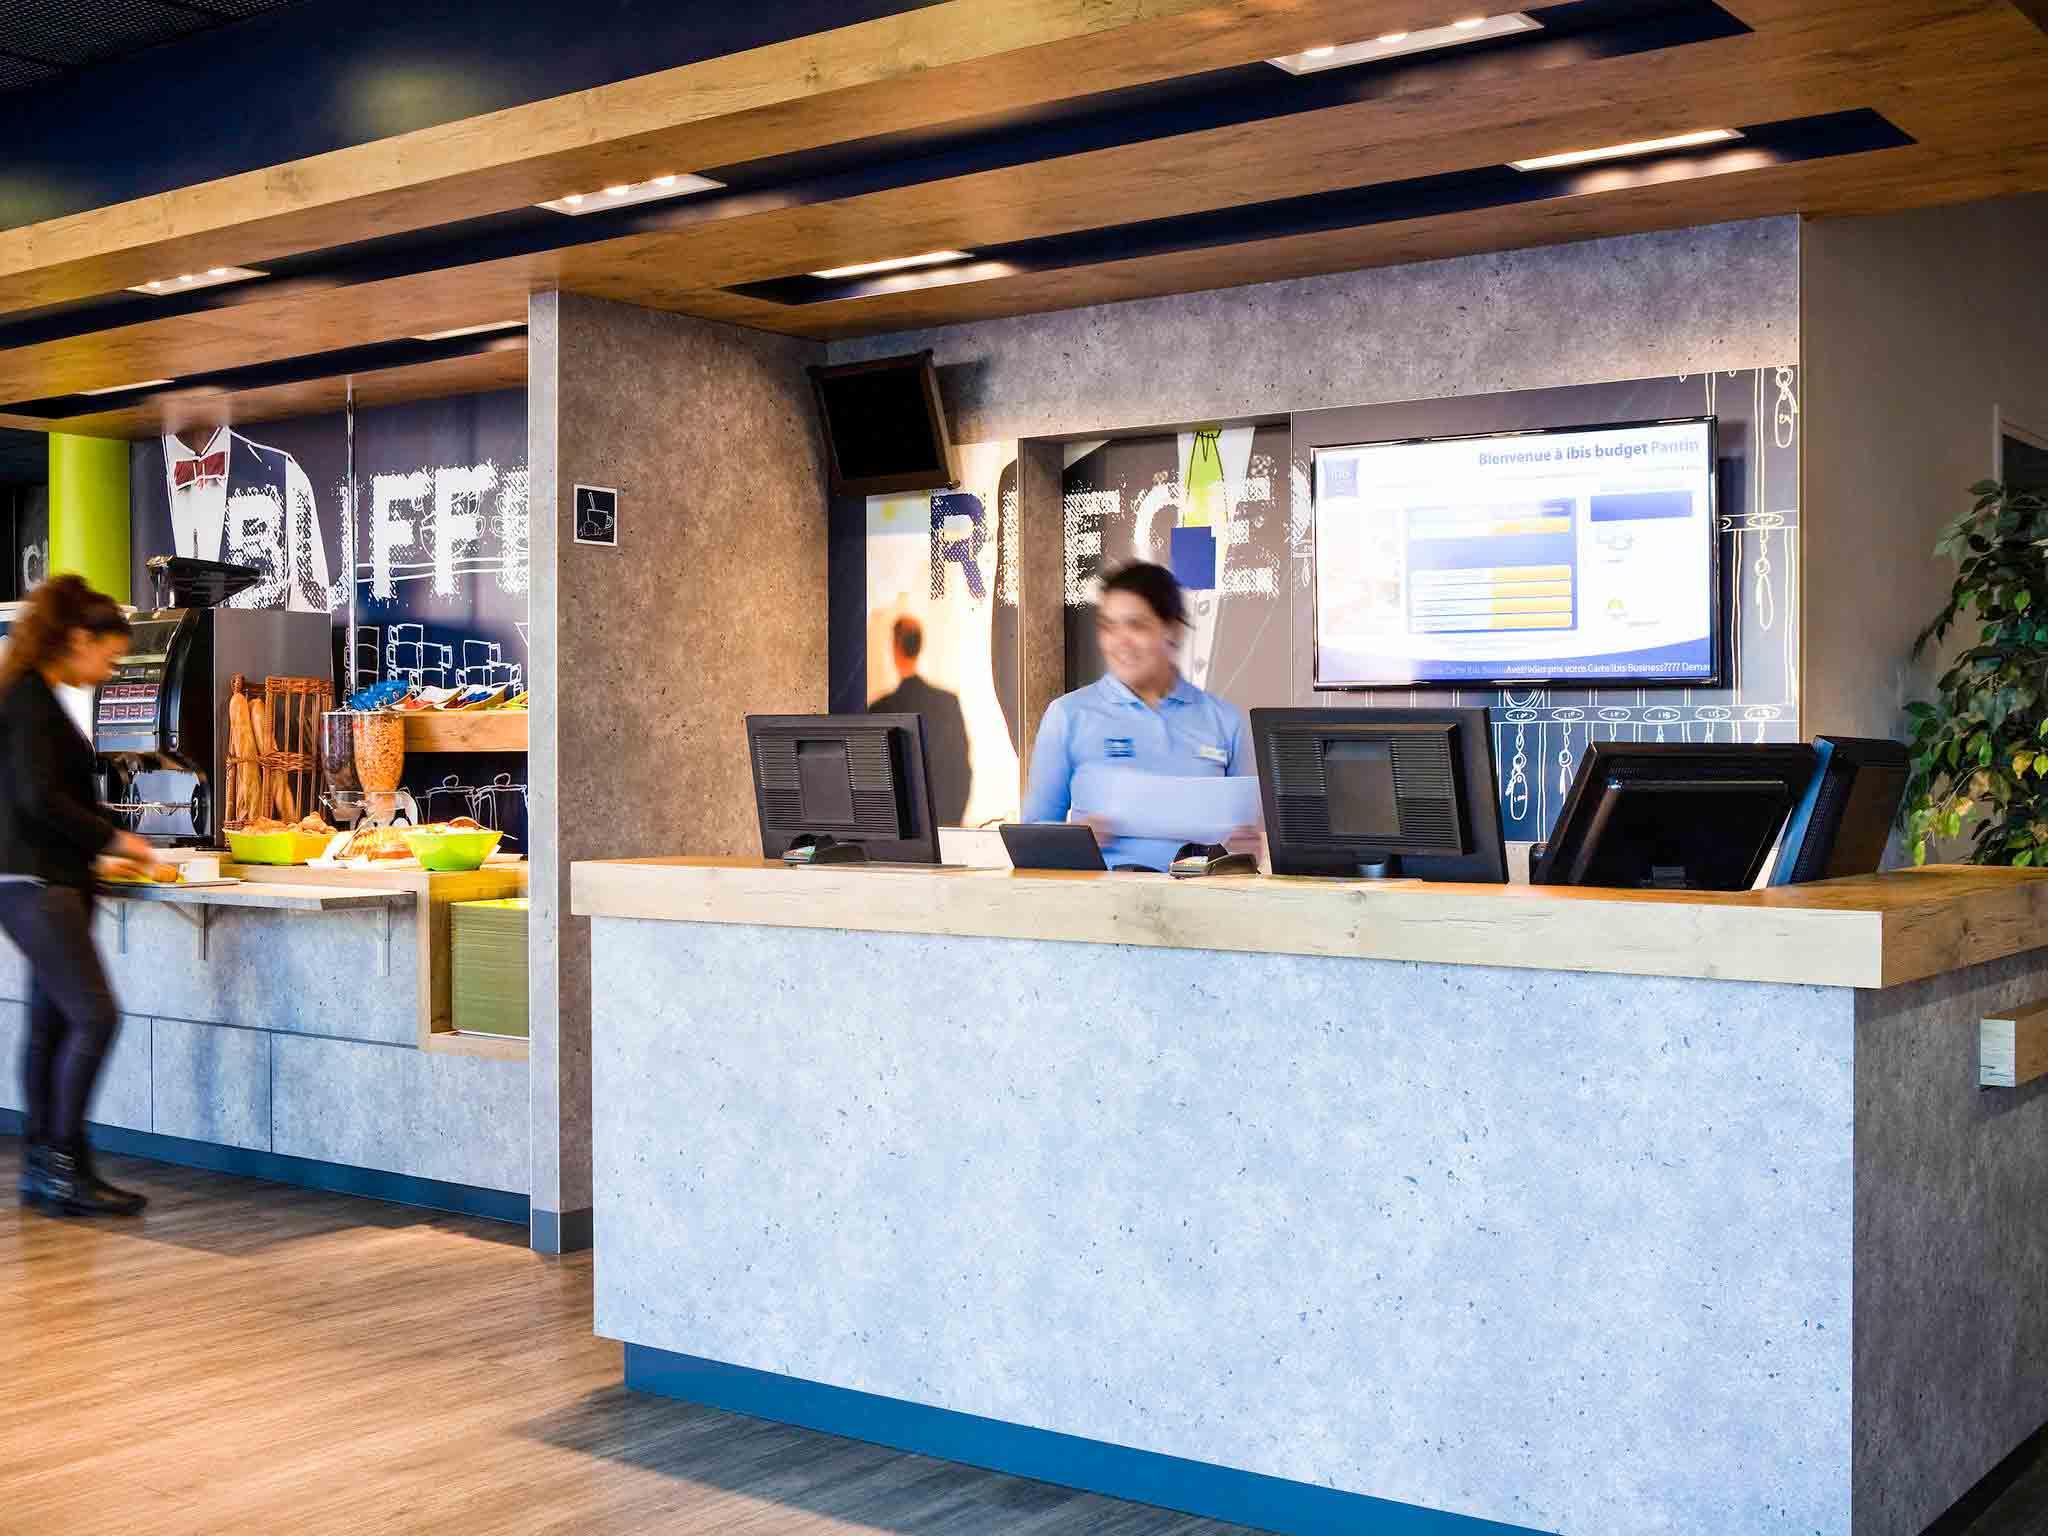 Hotel in pantin ibis budget paris porte de pantin - Station service porte de pantin ...